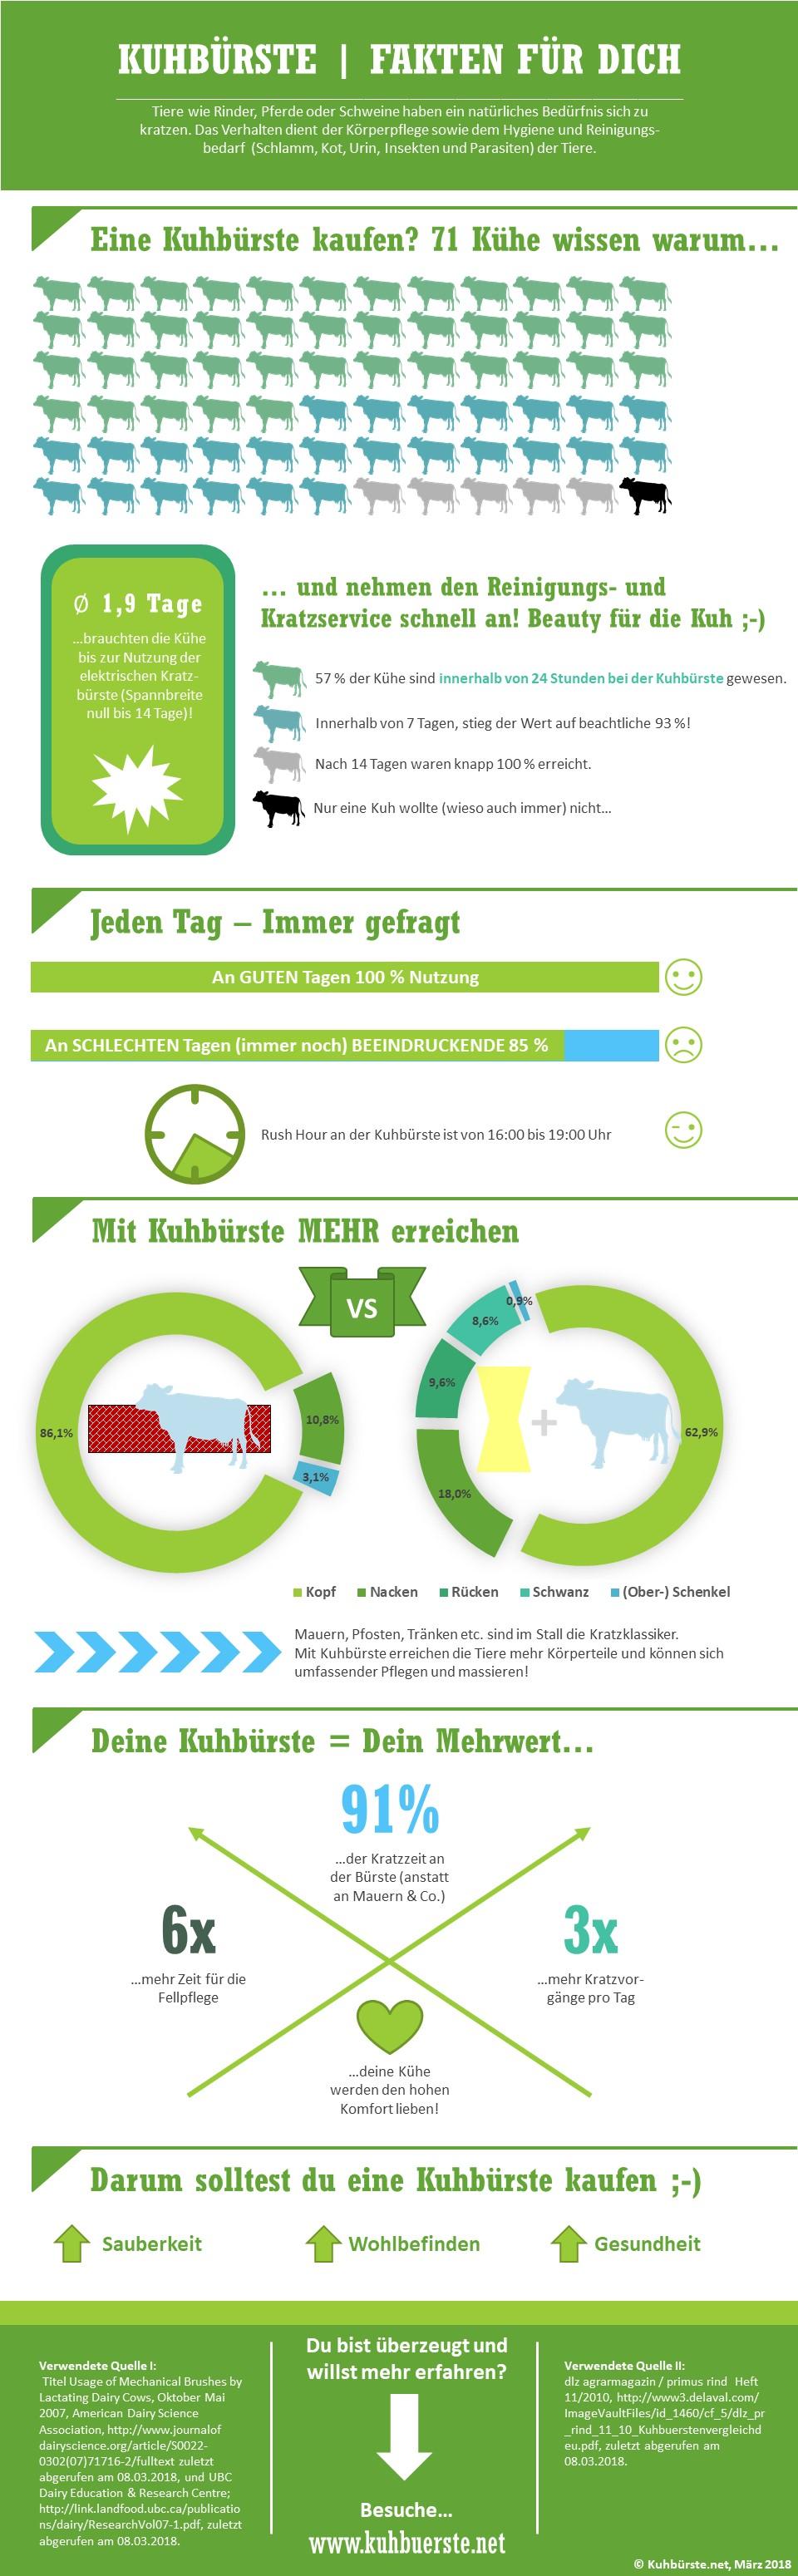 Kuh-Viehbürste Infografik